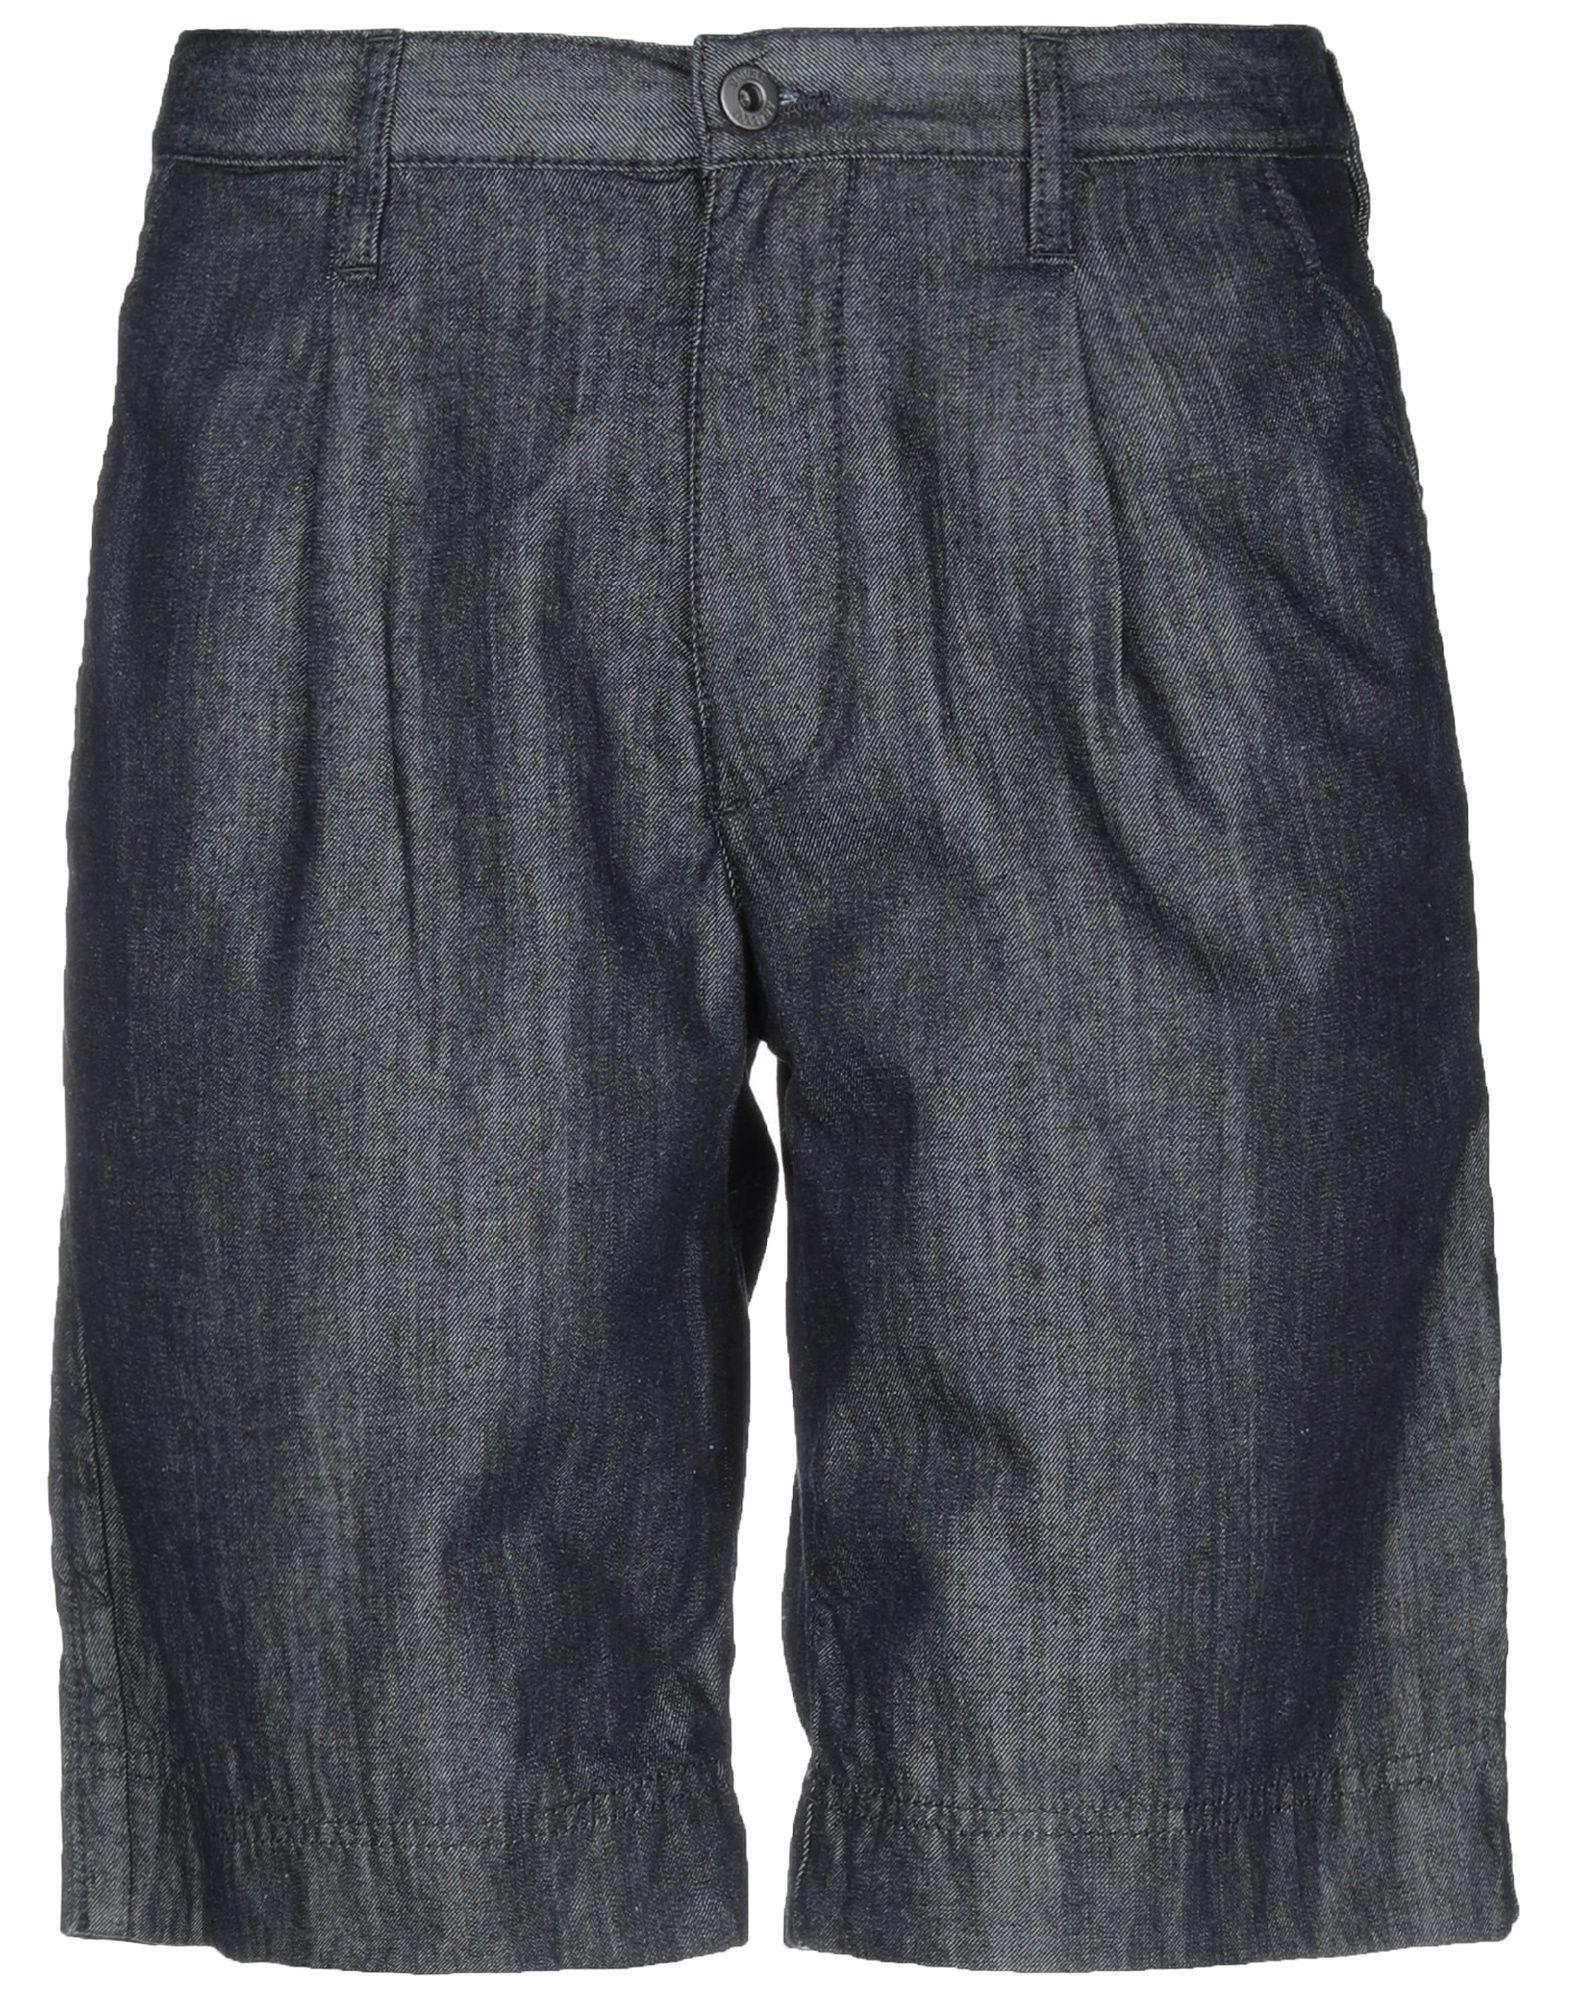 ARMANI JEANS Джинсовые бермуды бермуды джинсовые onsbull